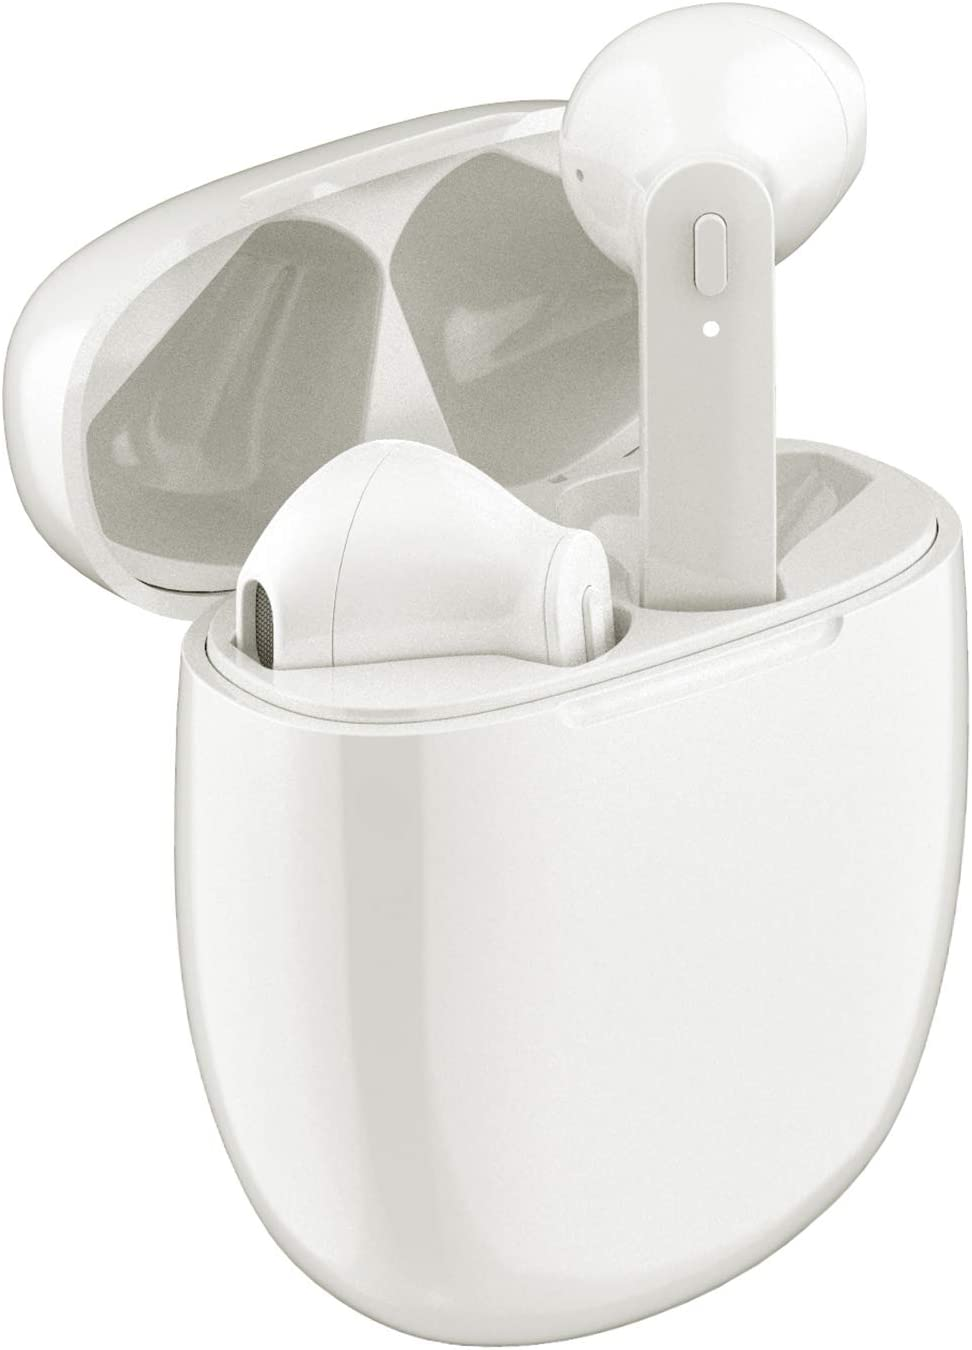 Rademax Bluetooth Headphones